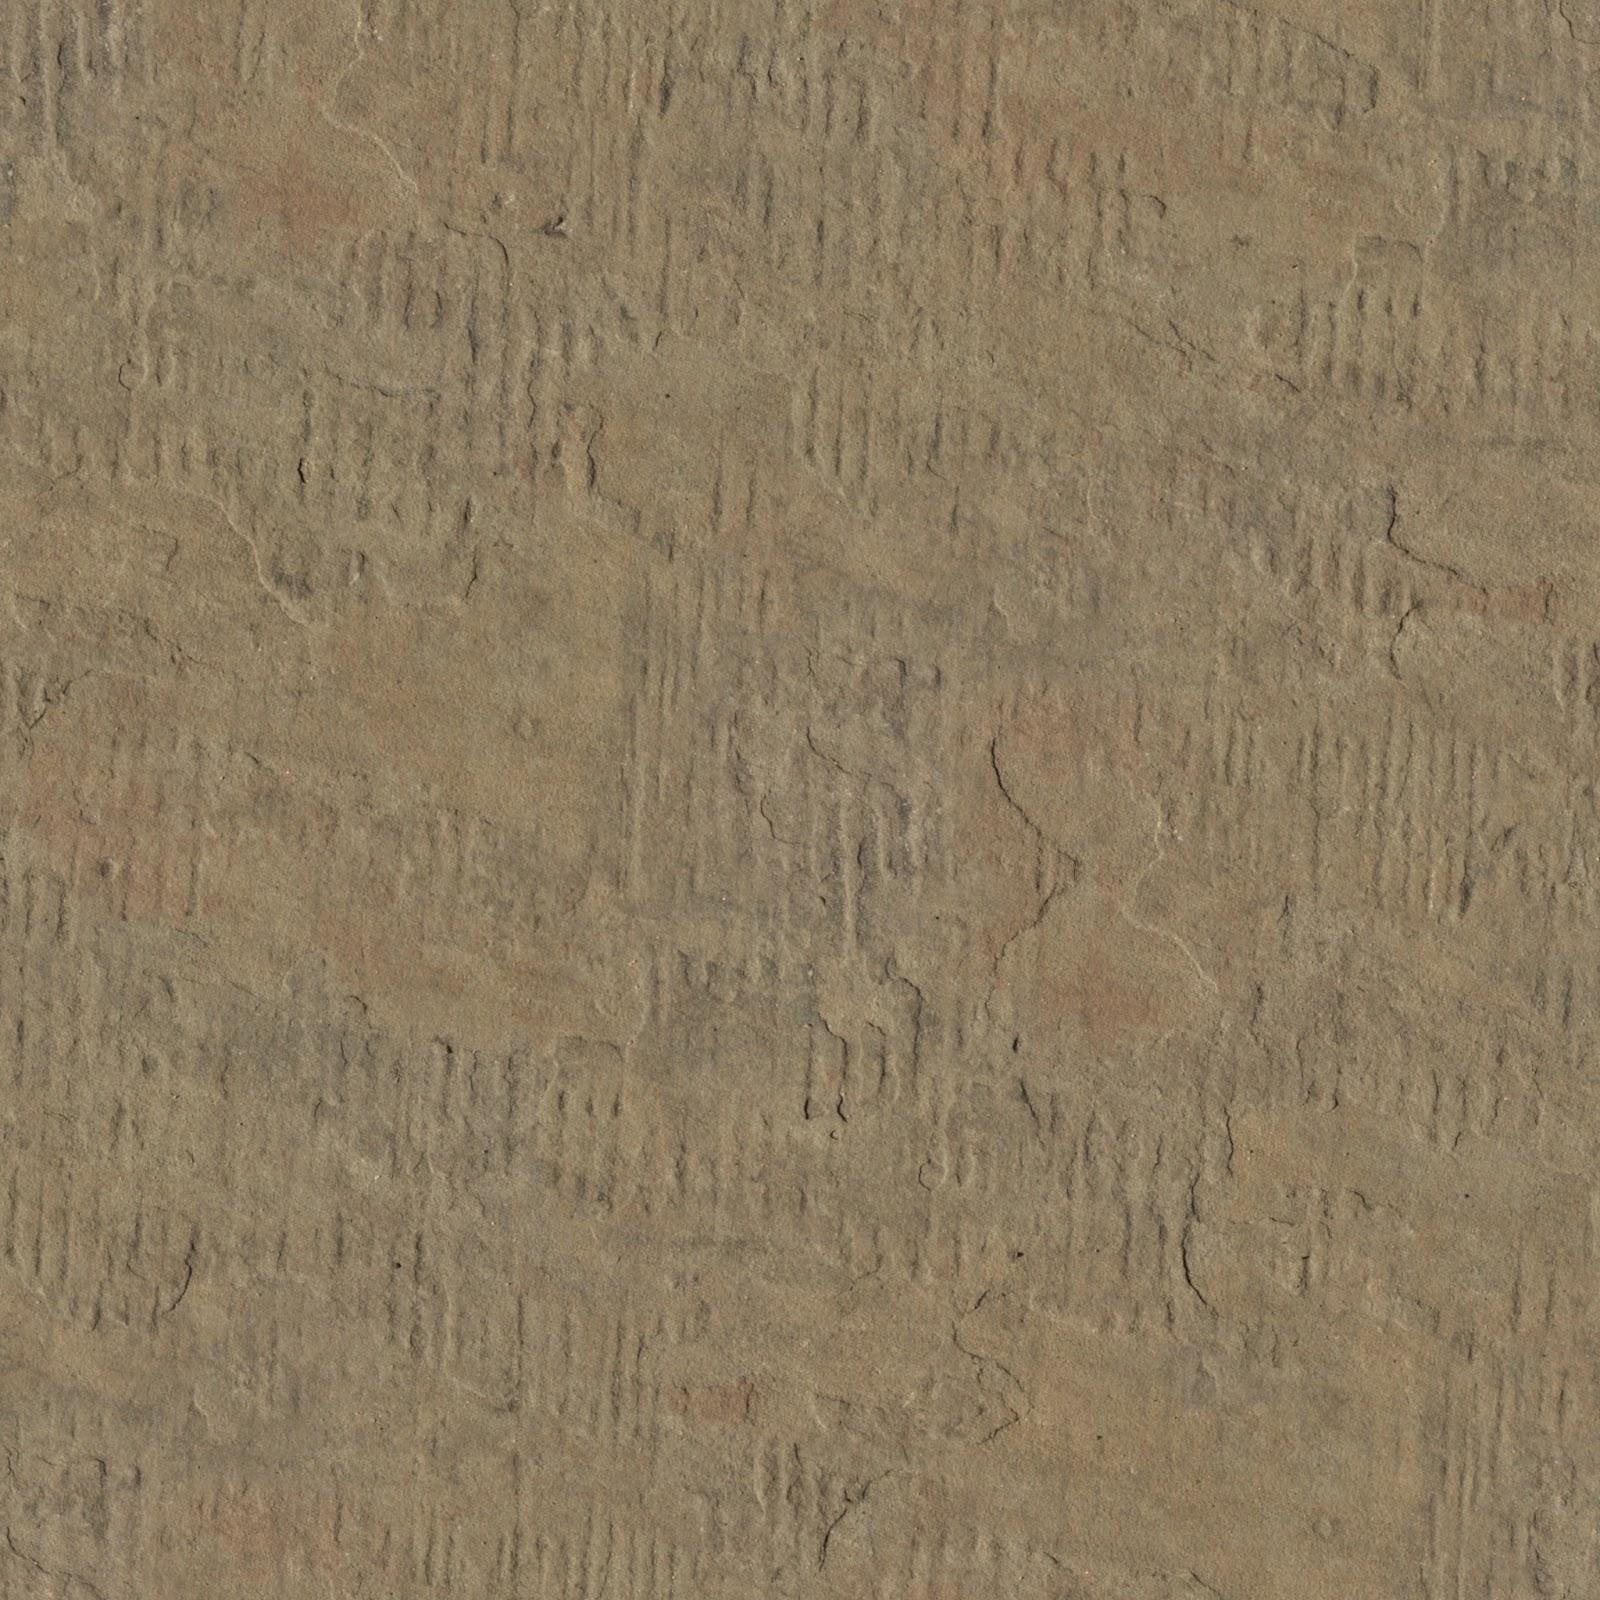 (Stone 4) rock cave mountain brown seamless texture 2048x2048